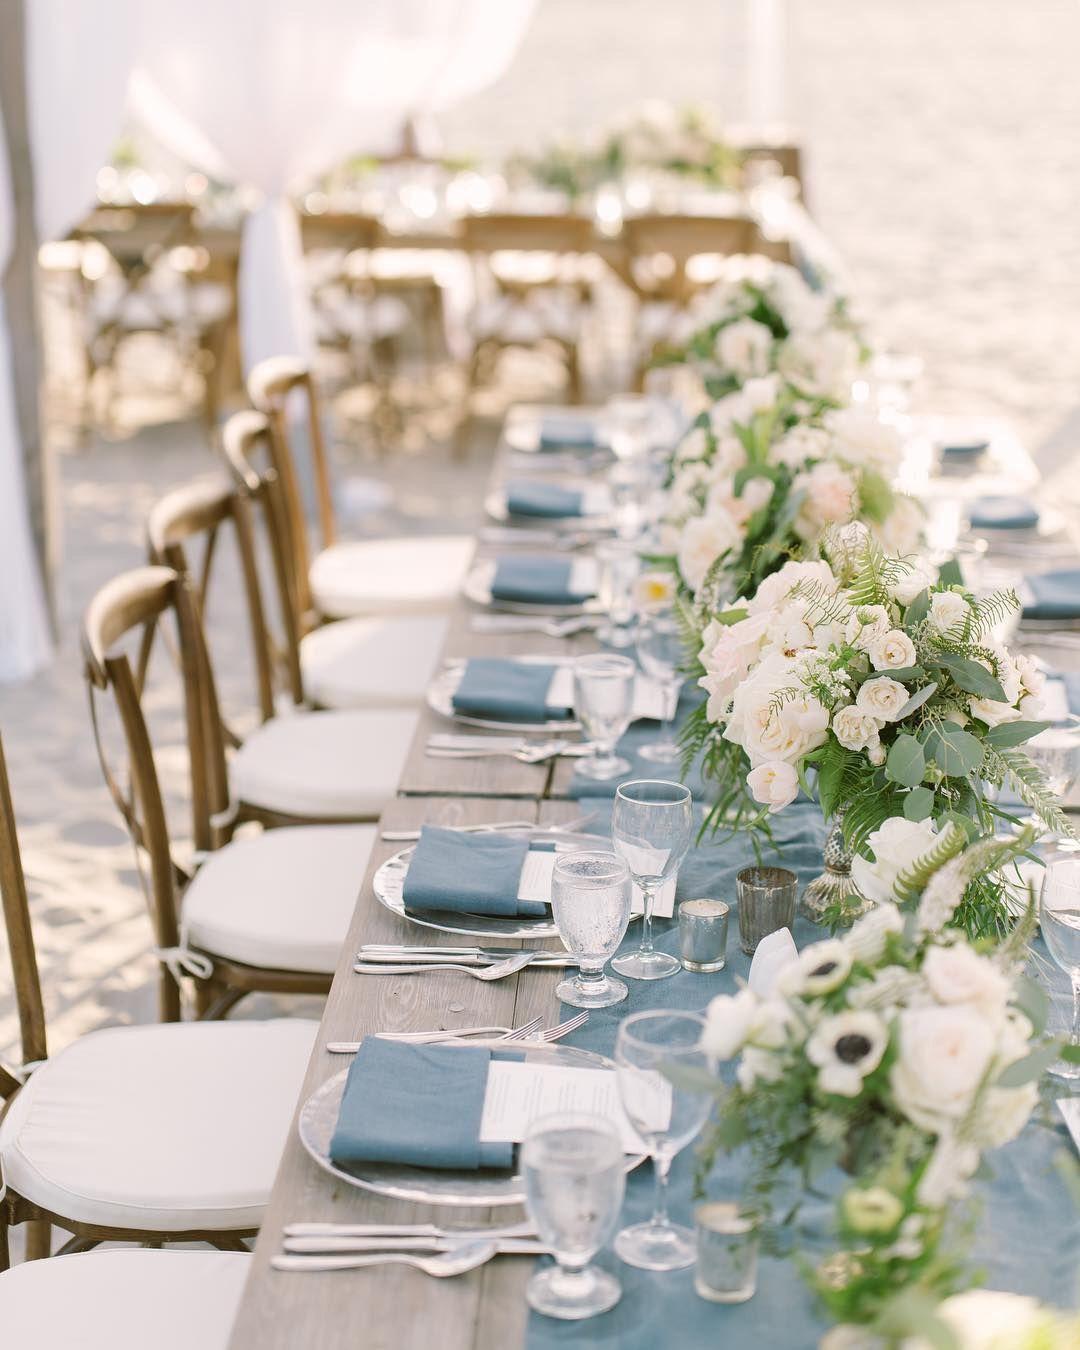 Dusty Blue Table Decorations Blue Wedding Decorations Blue Themed Wedding Wedding Reception Tables